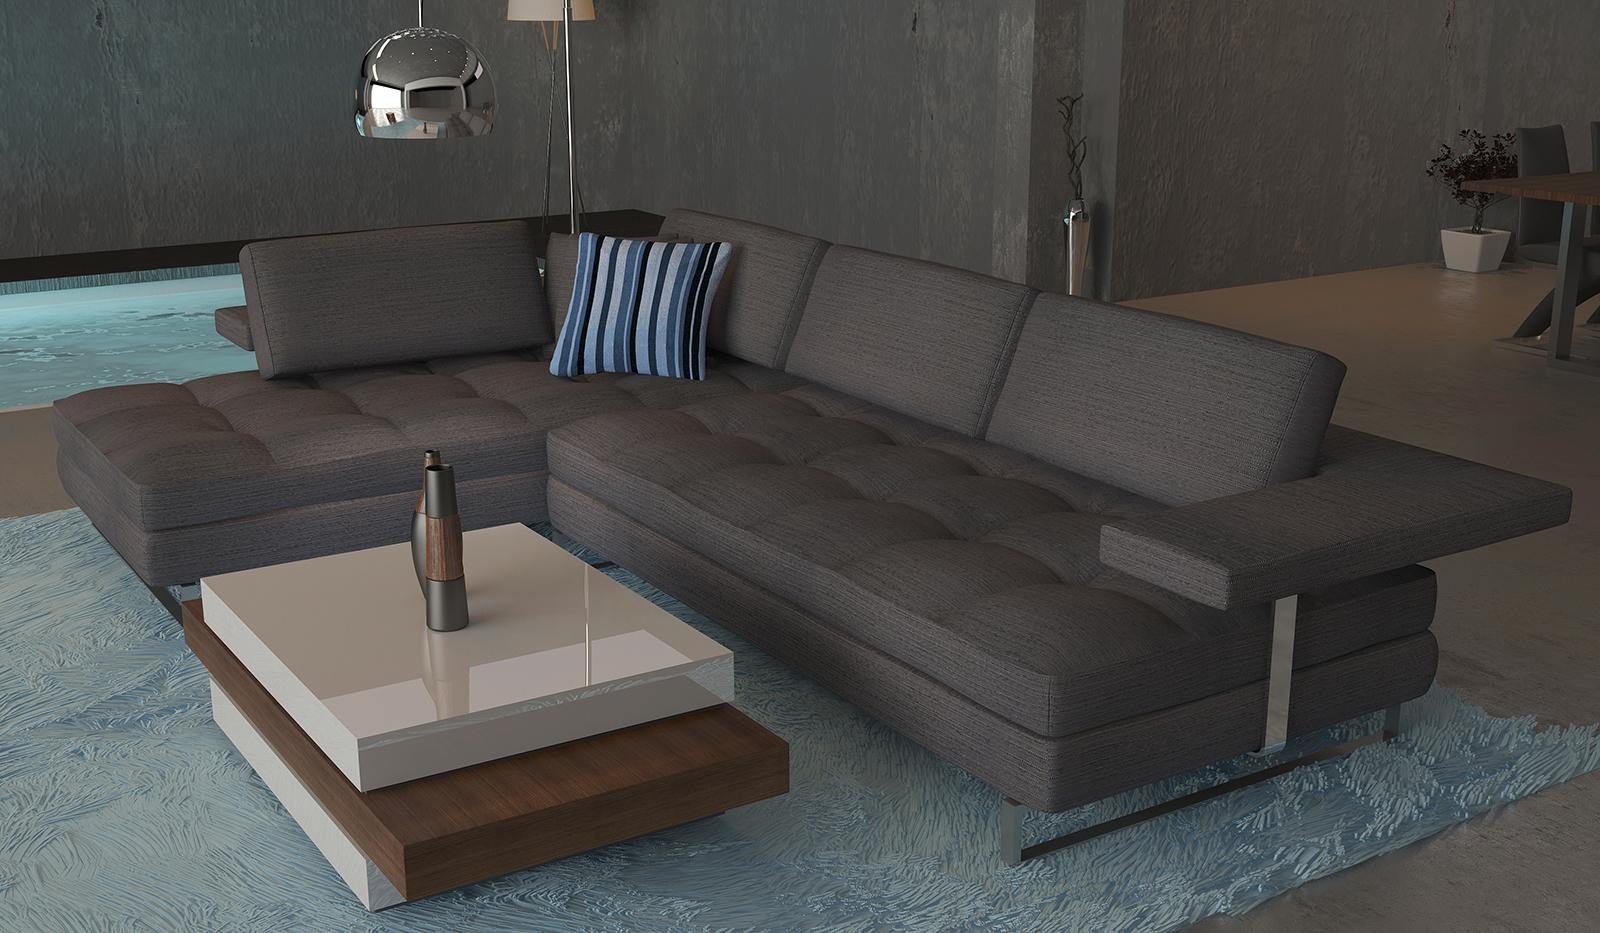 Milano.de_furniture_Sofa & table_02_Yianart